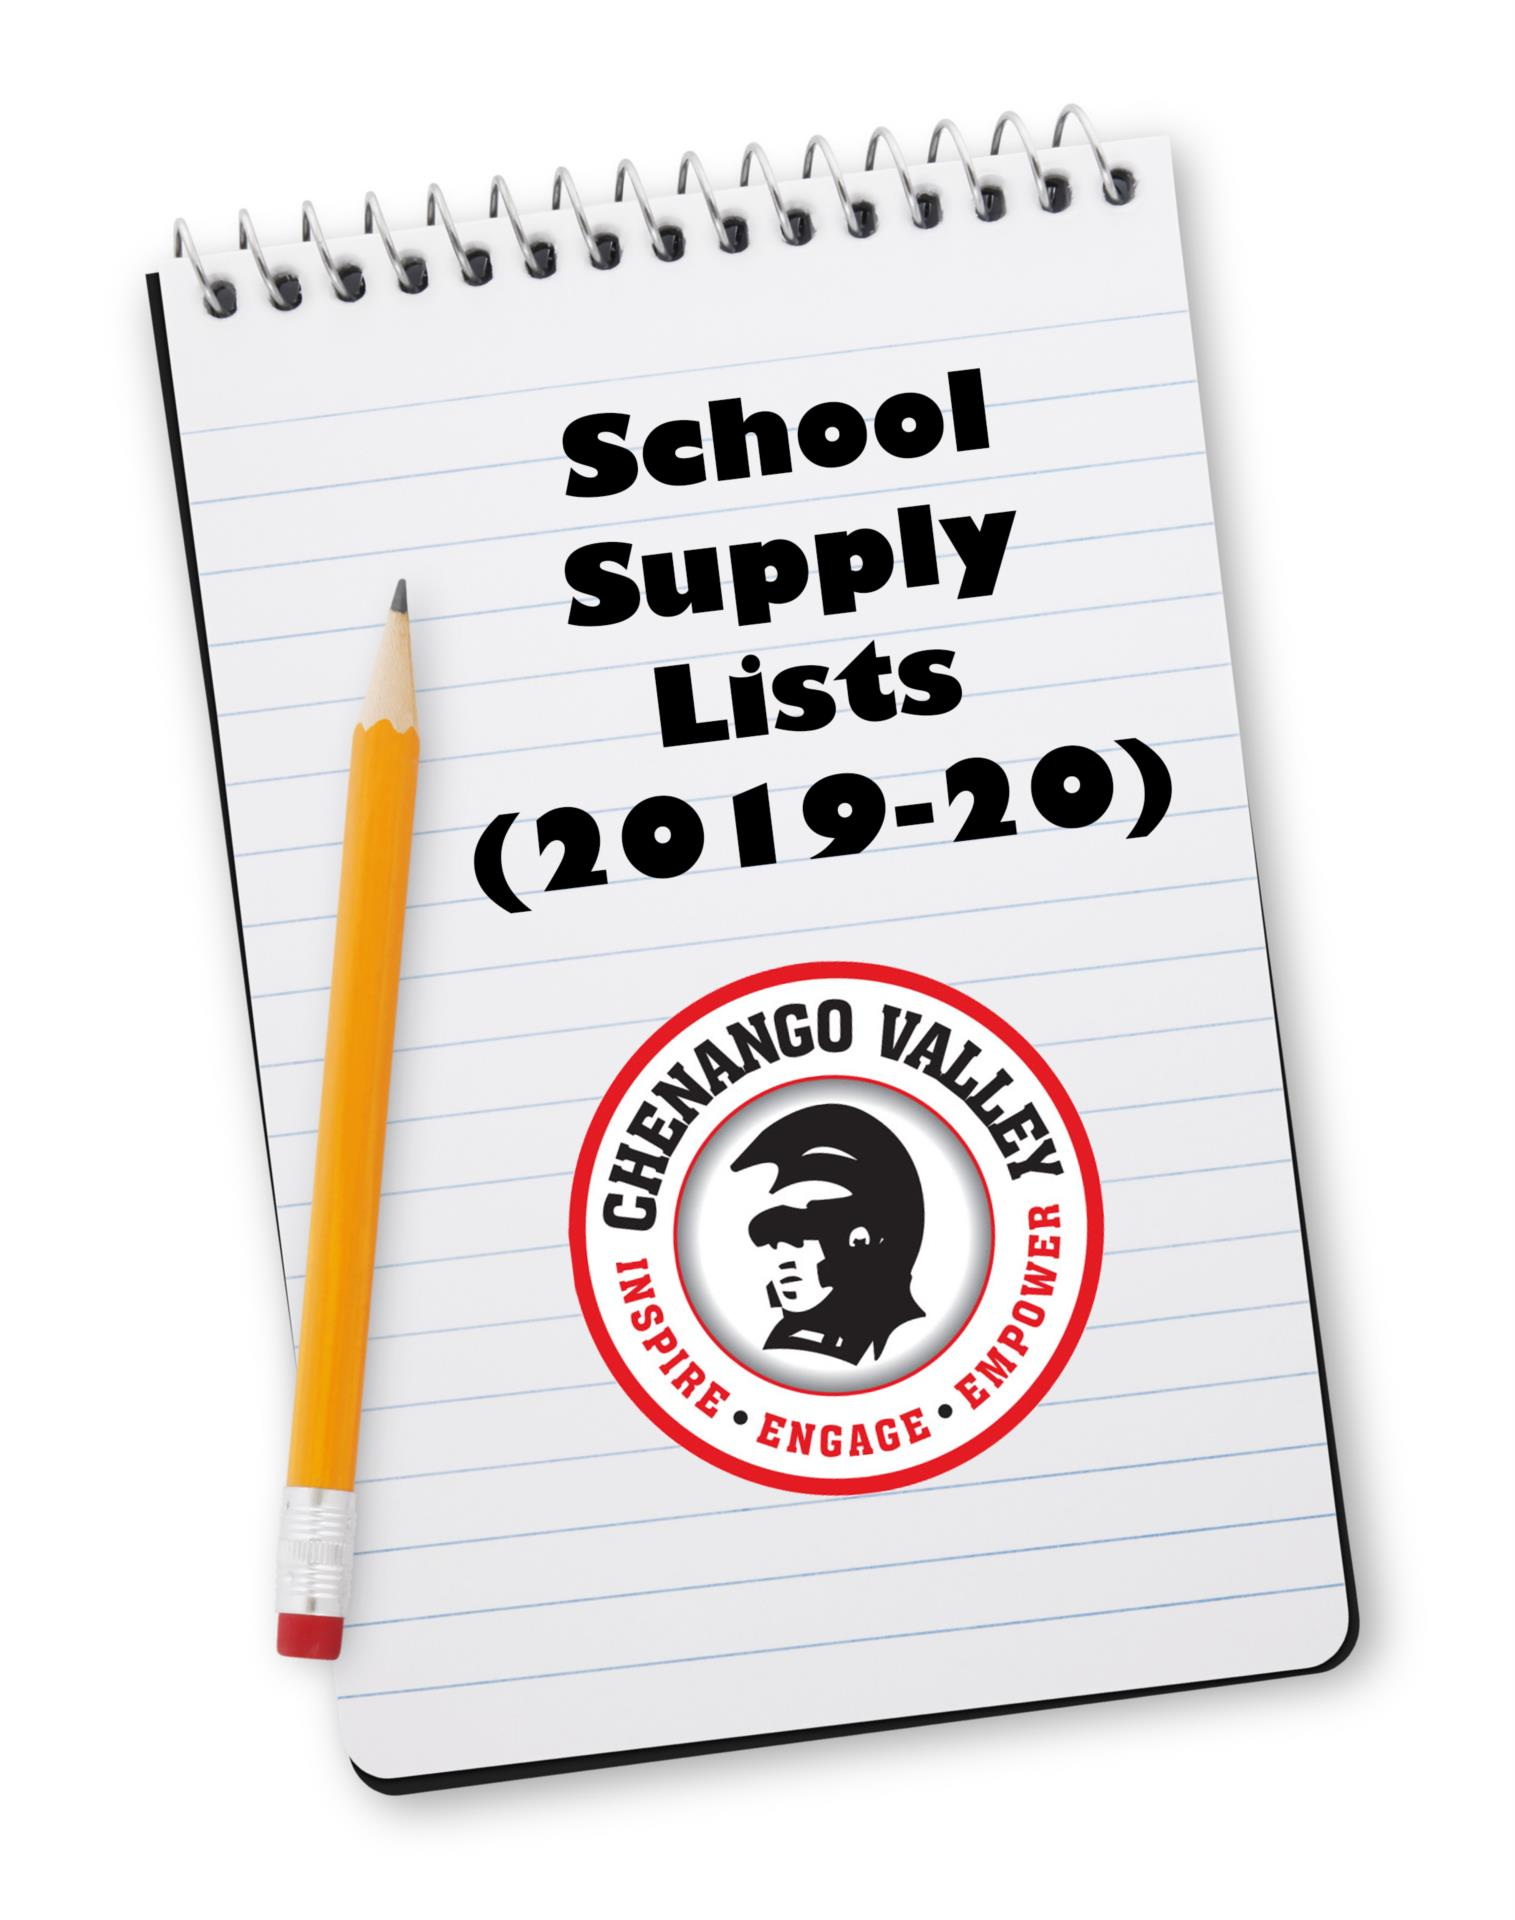 school supply lists 2019-20